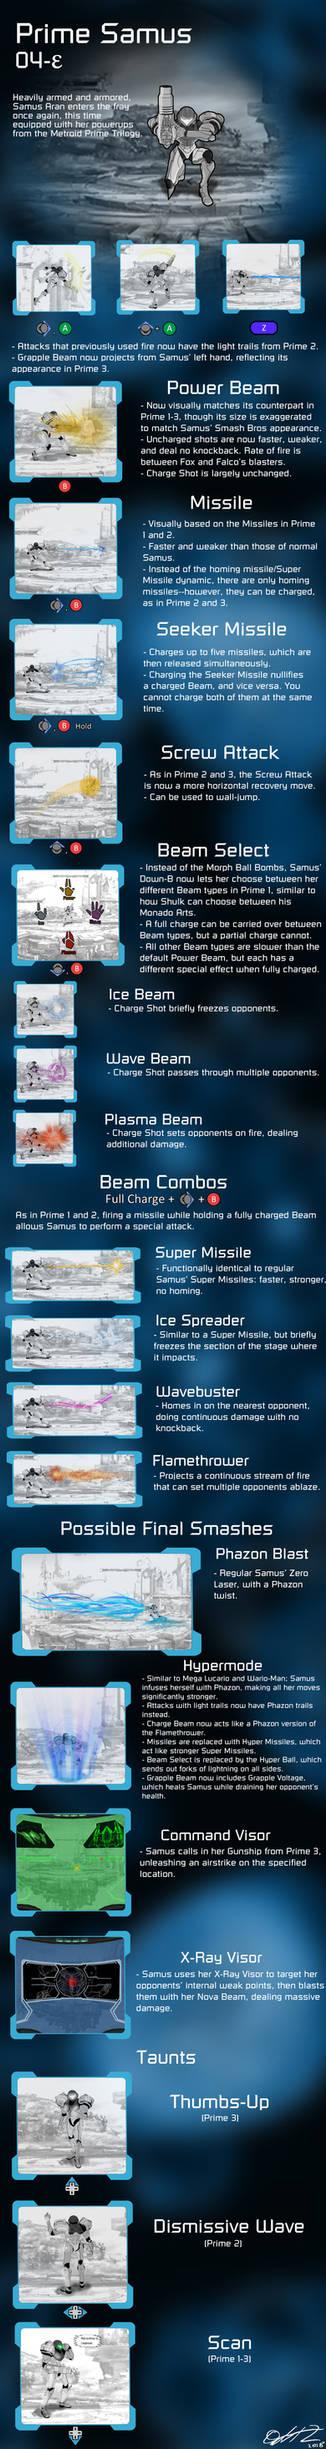 Hypothetical Smash Bros Character: Prime Samus